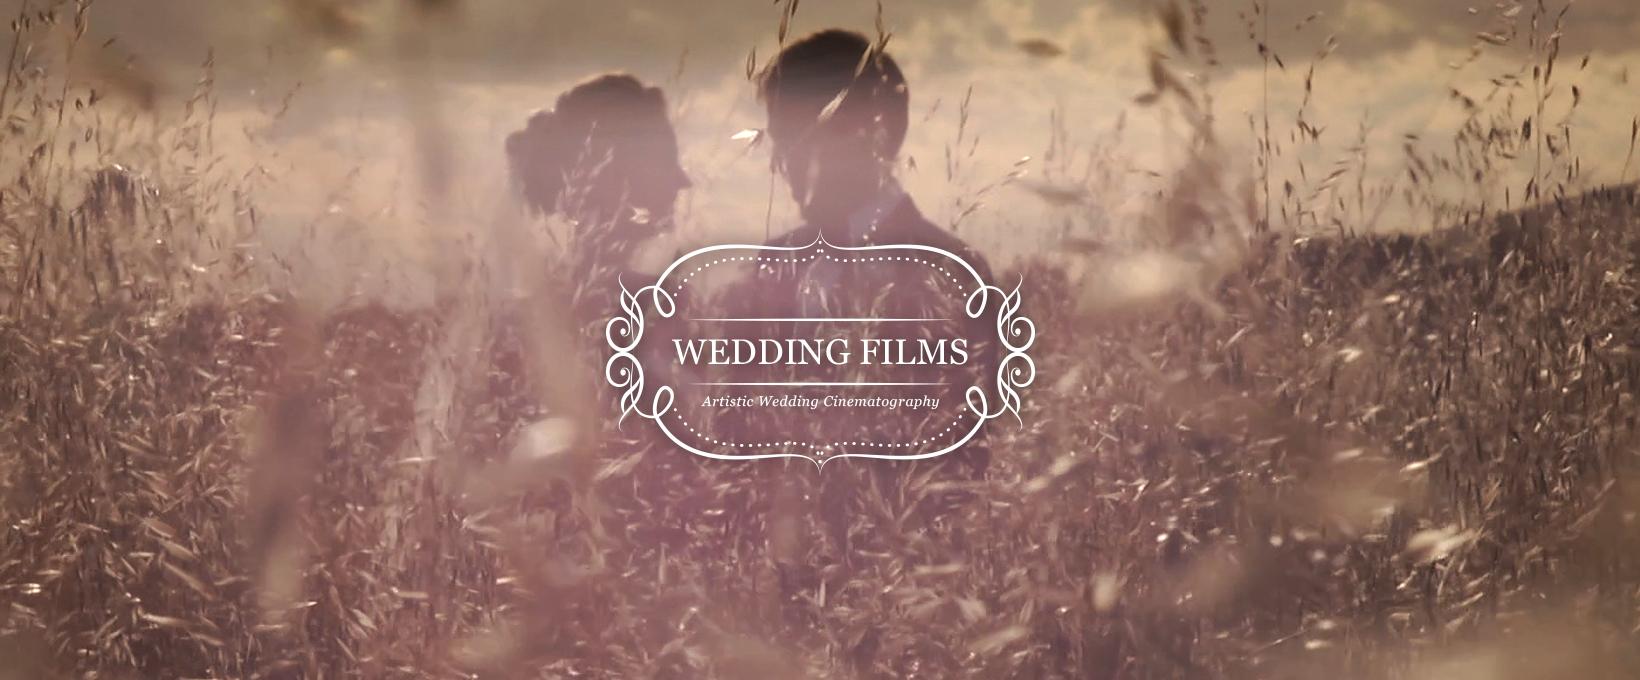 Wedding Films Wedding Videography